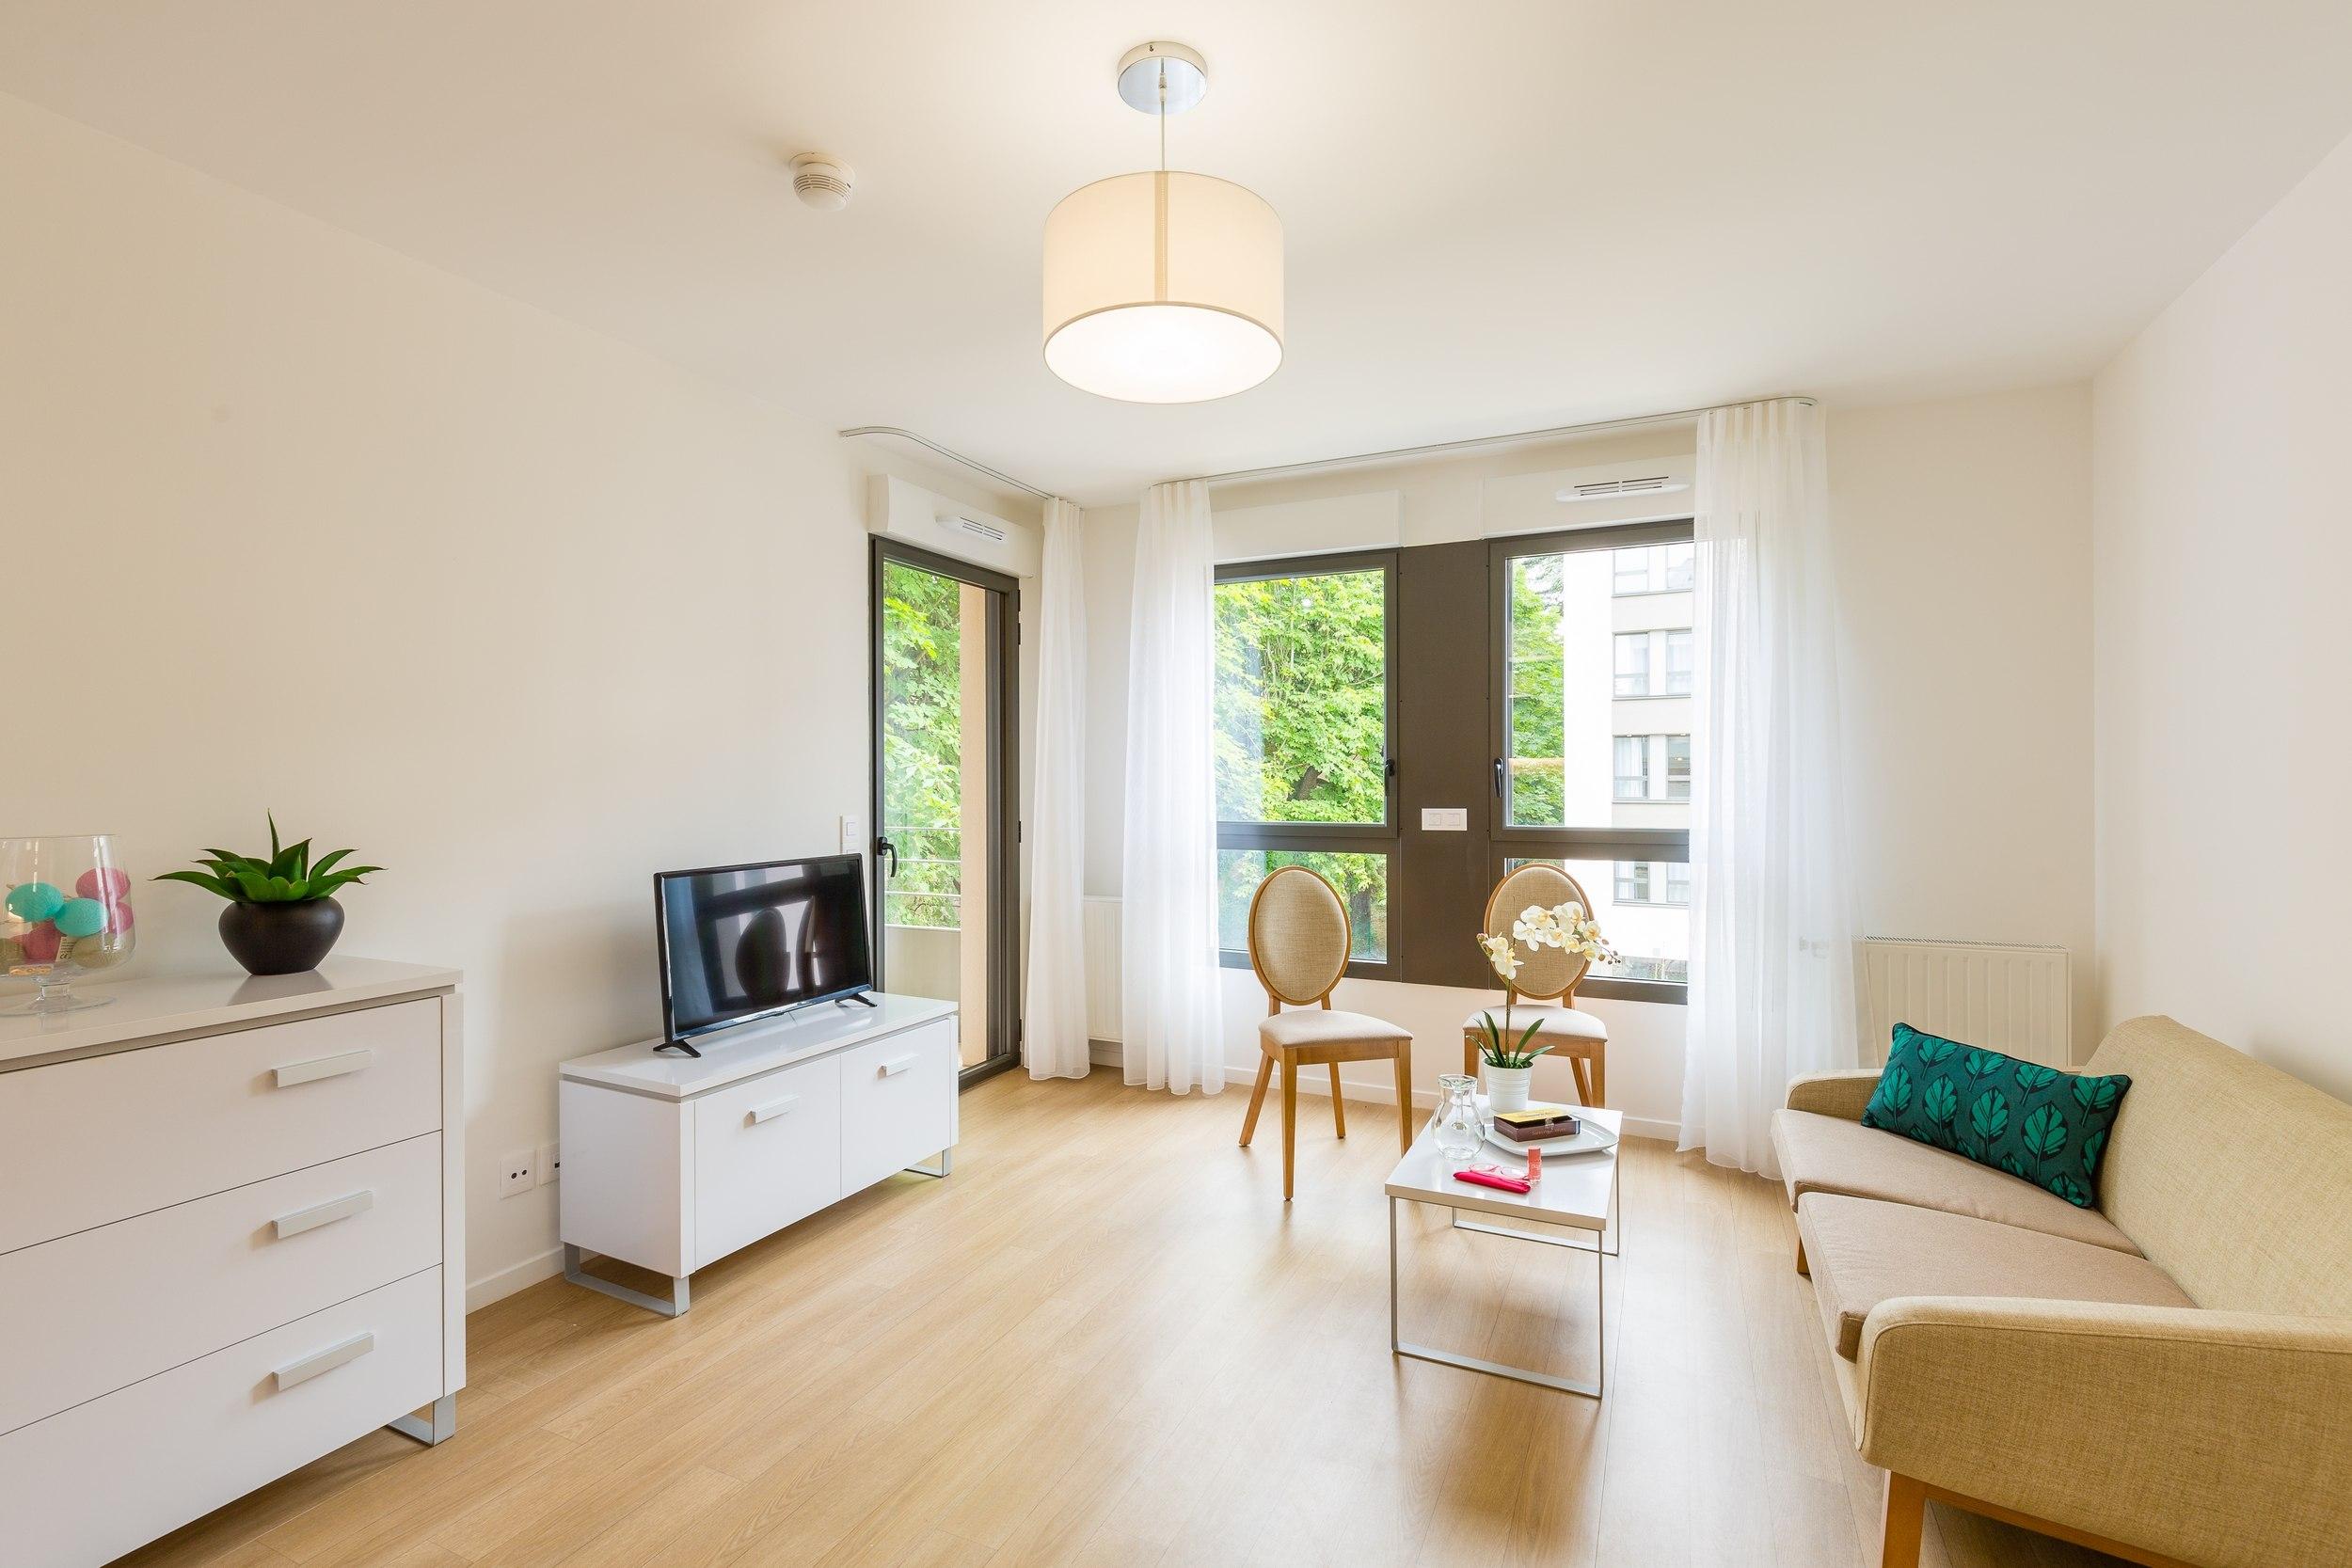 VSS - Appartements (2)